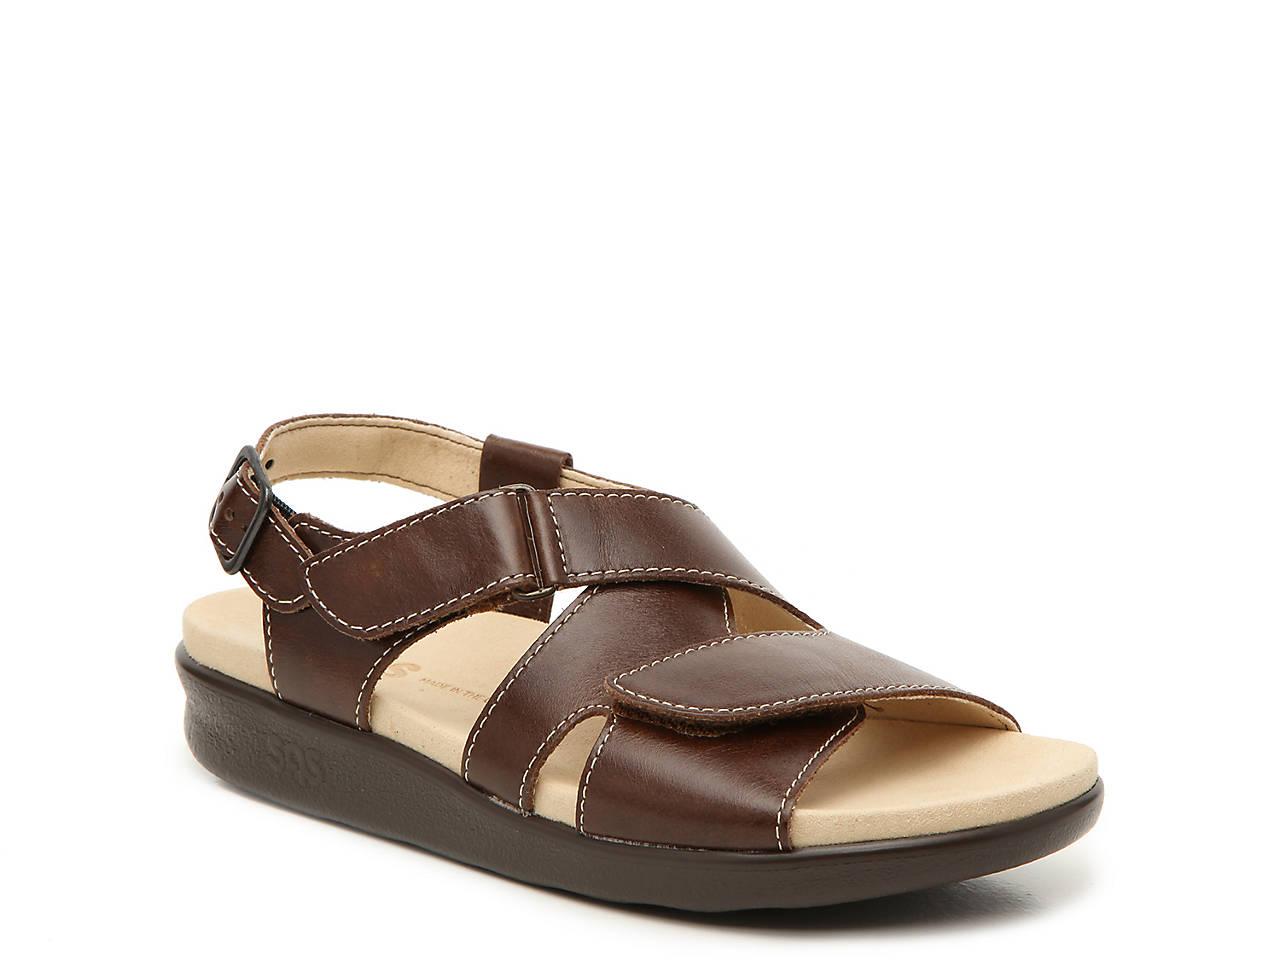 09781c17366 Huggy Wedge Sandal